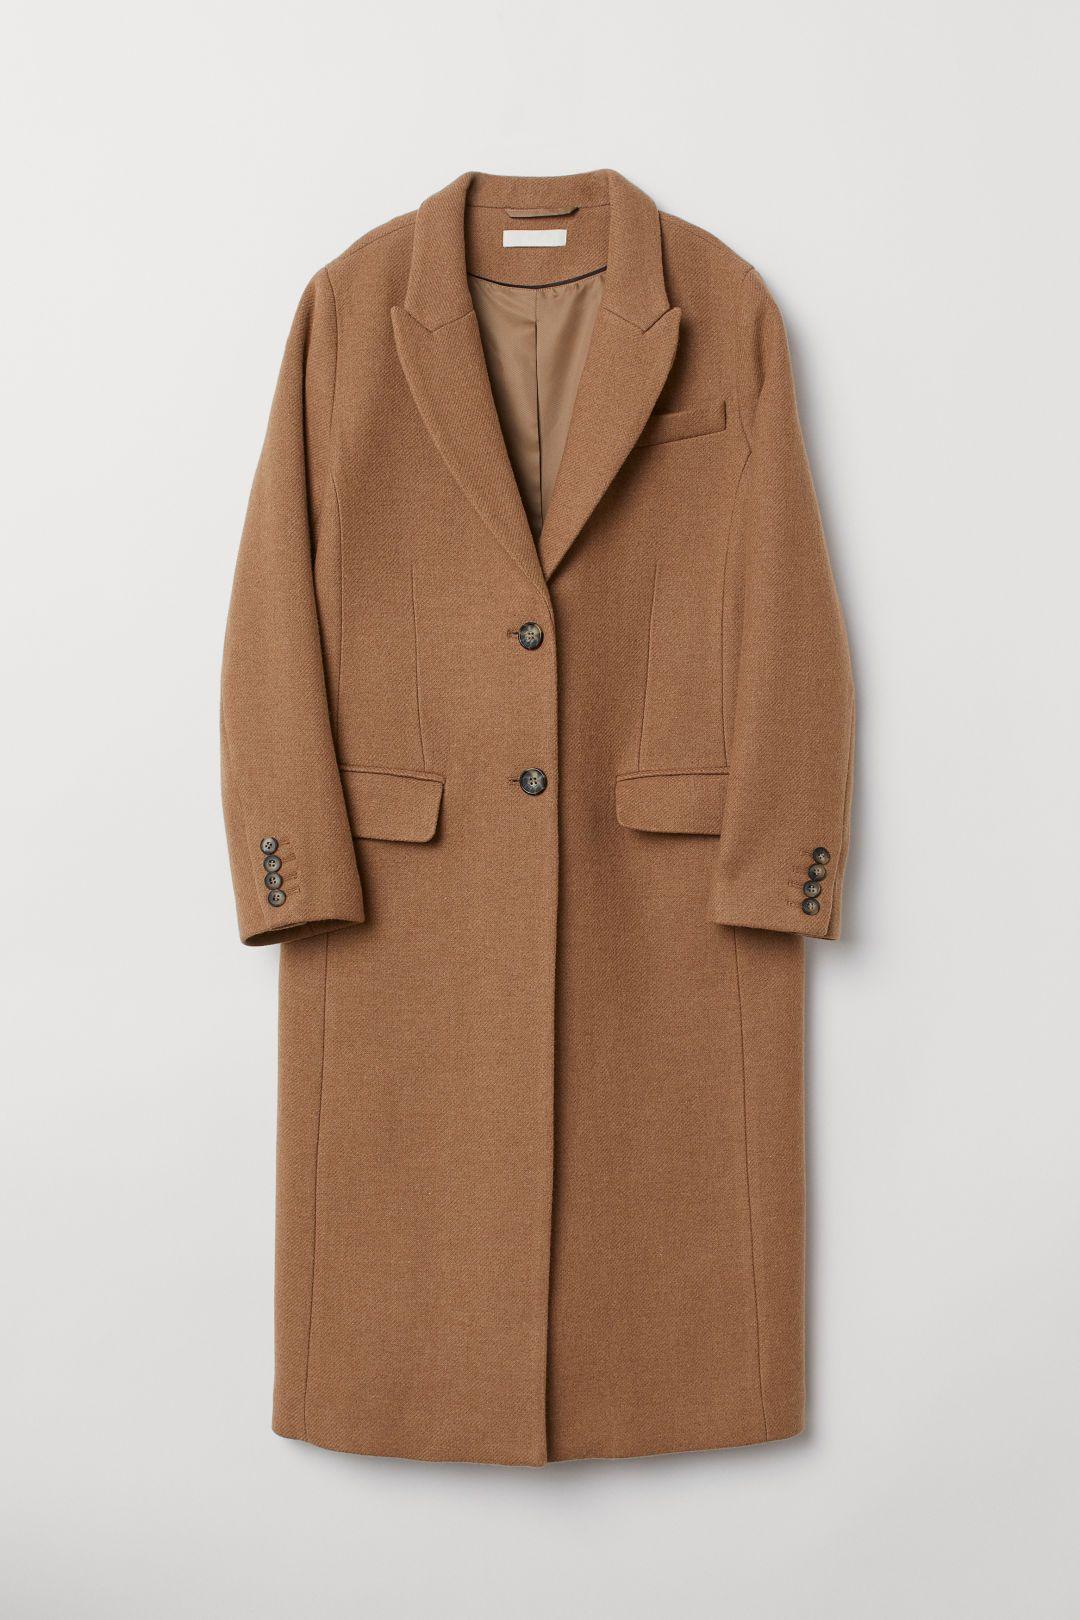 c649416ec Wool-blend Coat in 2019 | Fall/Christmas Wish List | Camel coat ...